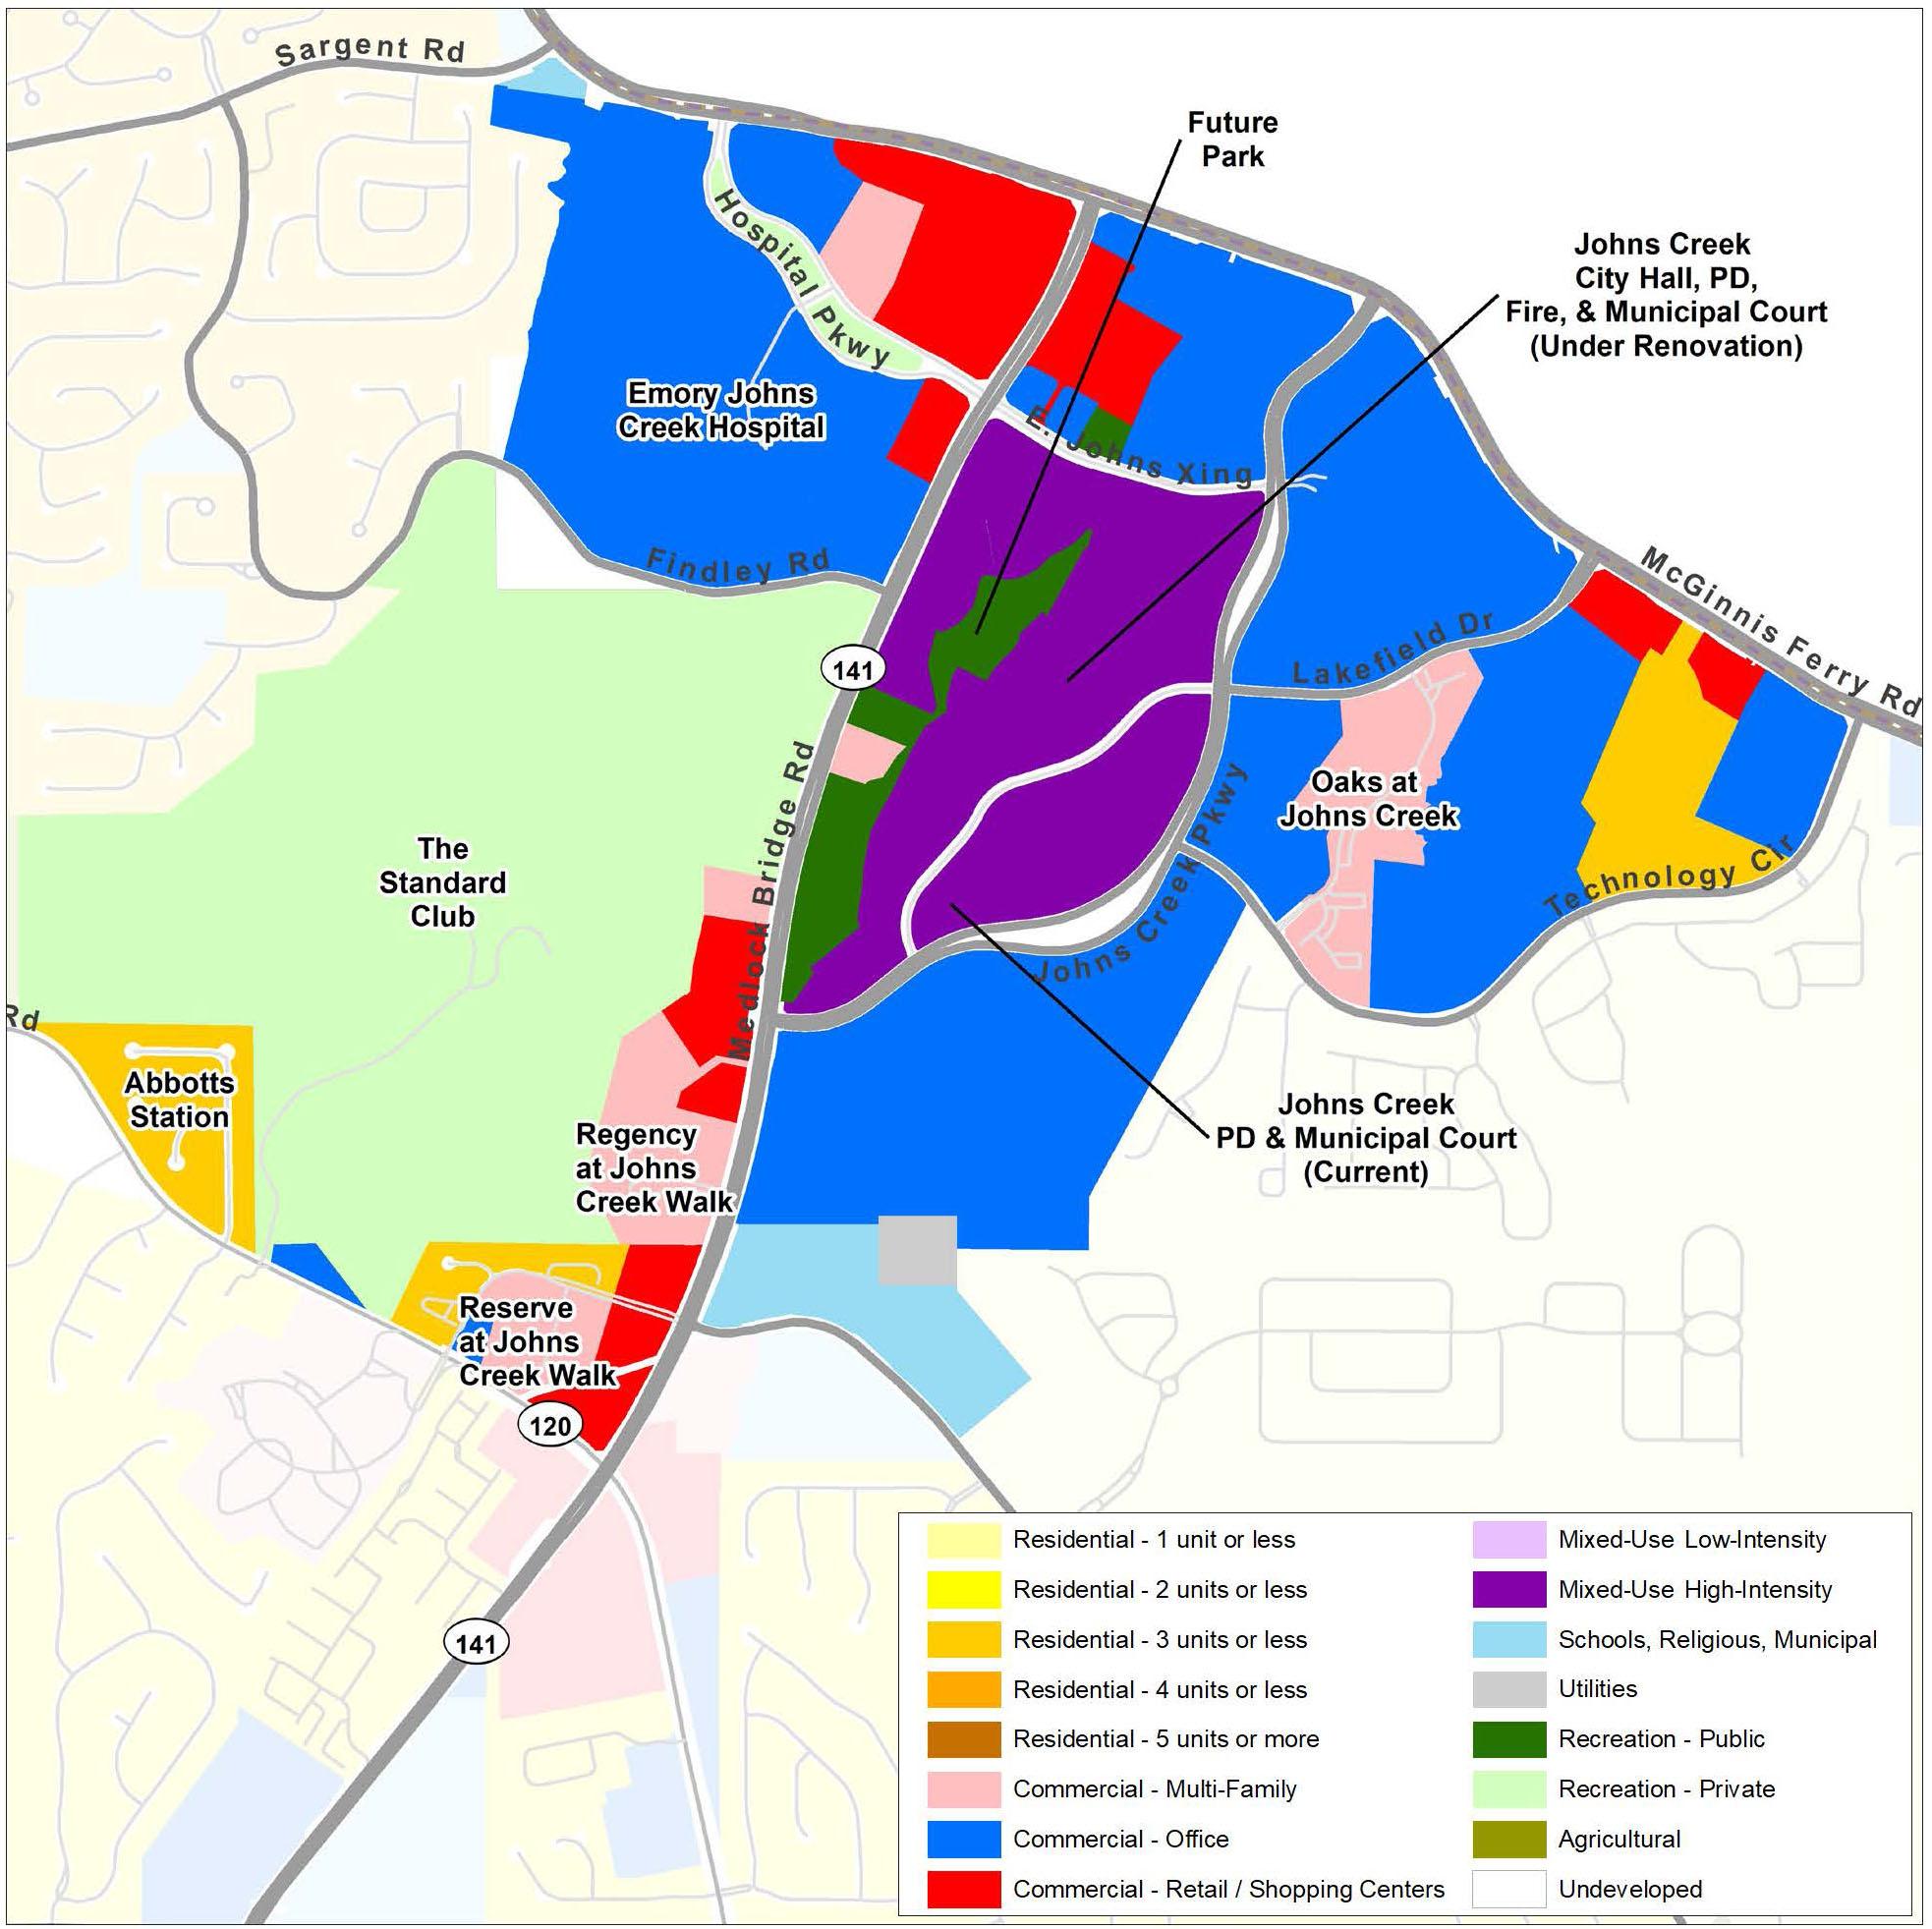 Tech Park: Future Land Use Map